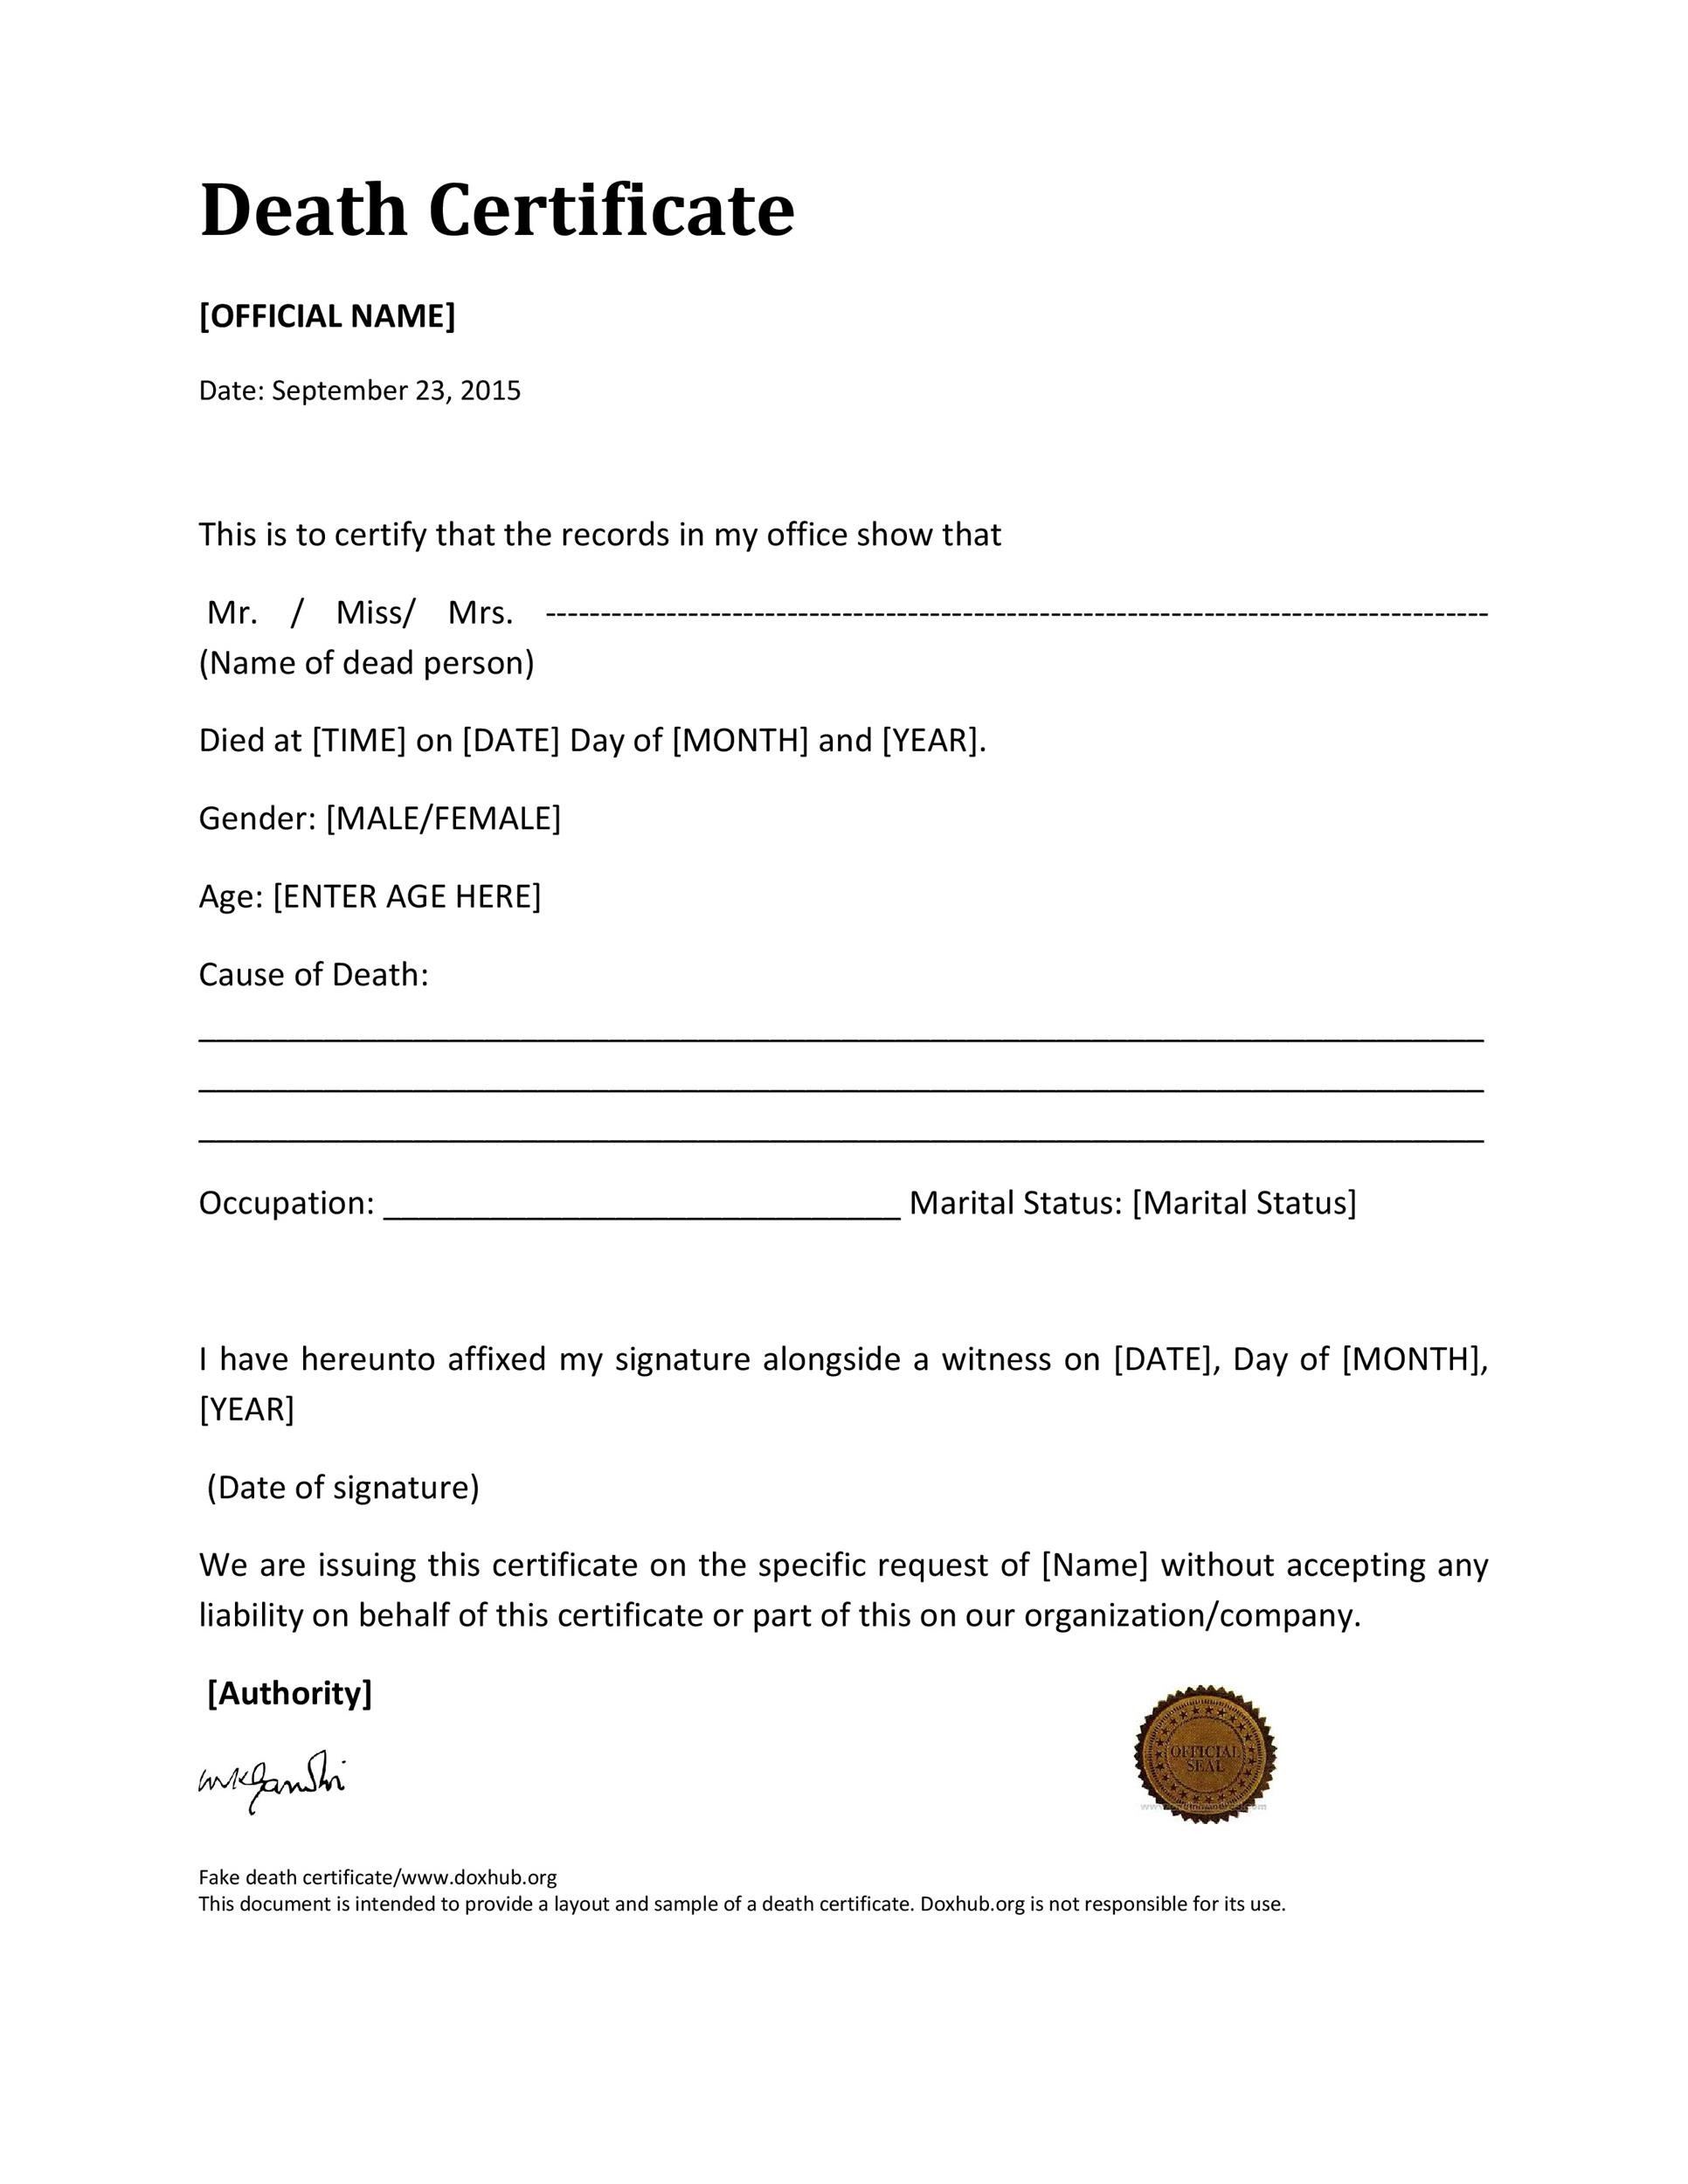 Free death certificate template 02